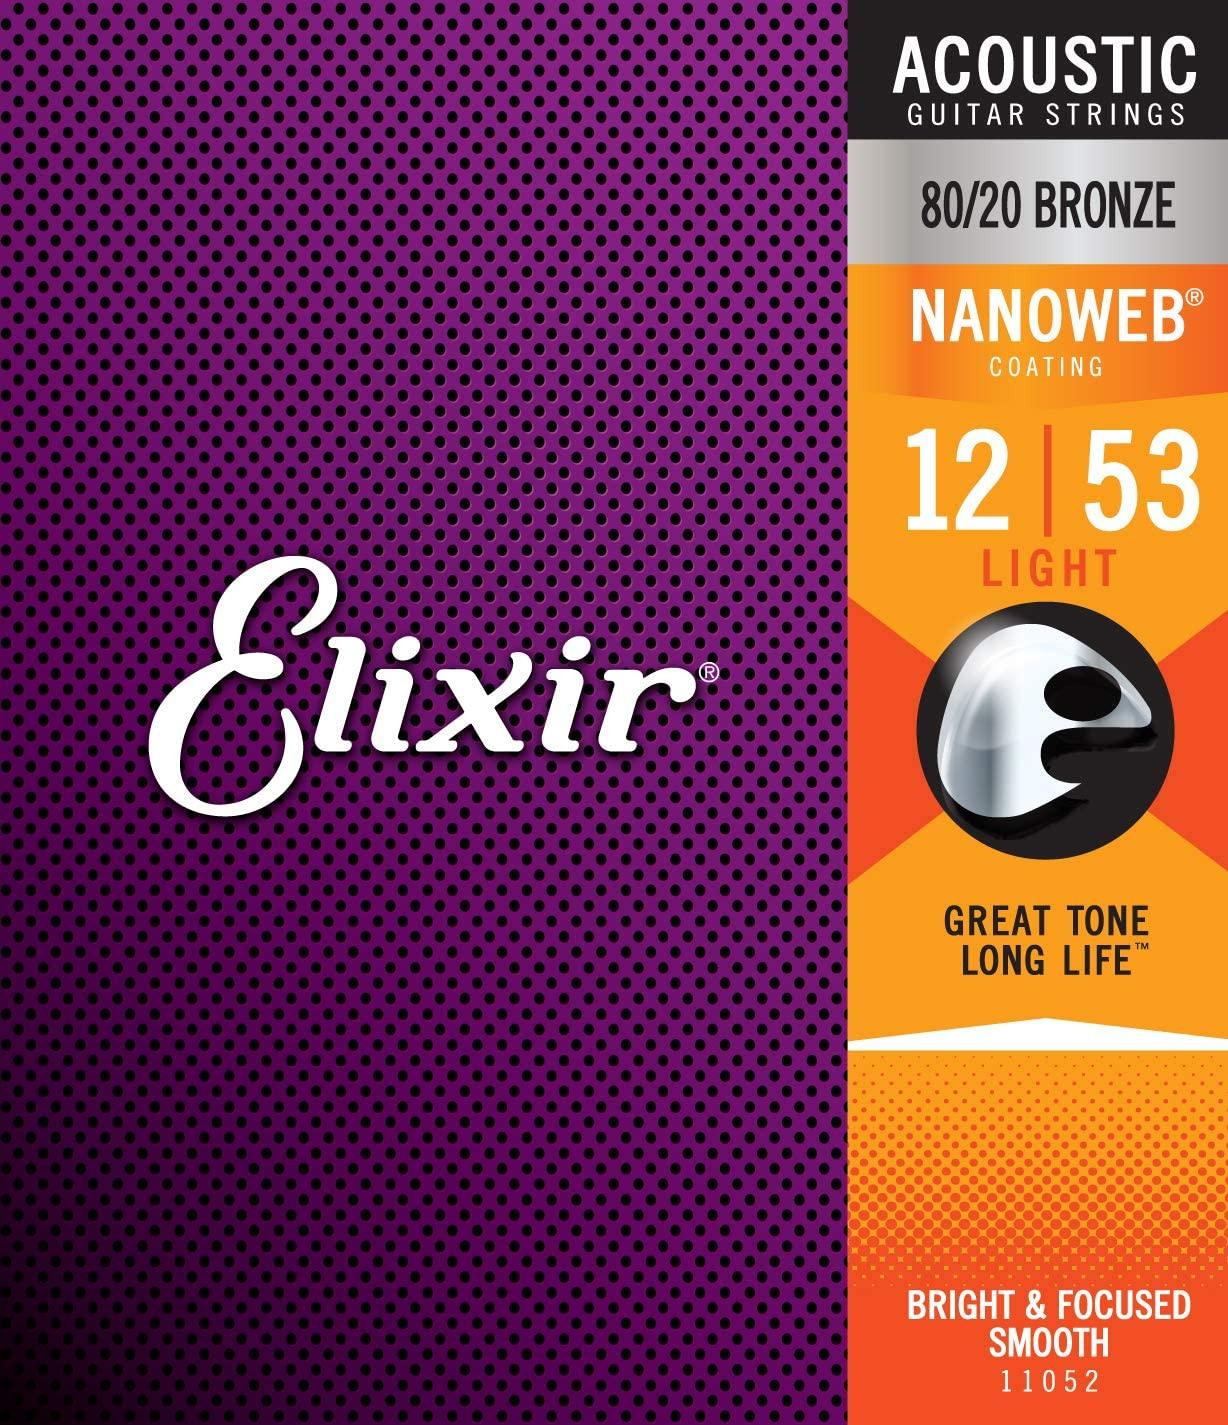 Elixir 80/20 Bronze Nanoweb Coated Acoustic Guitar Strings Light (12 - 53)